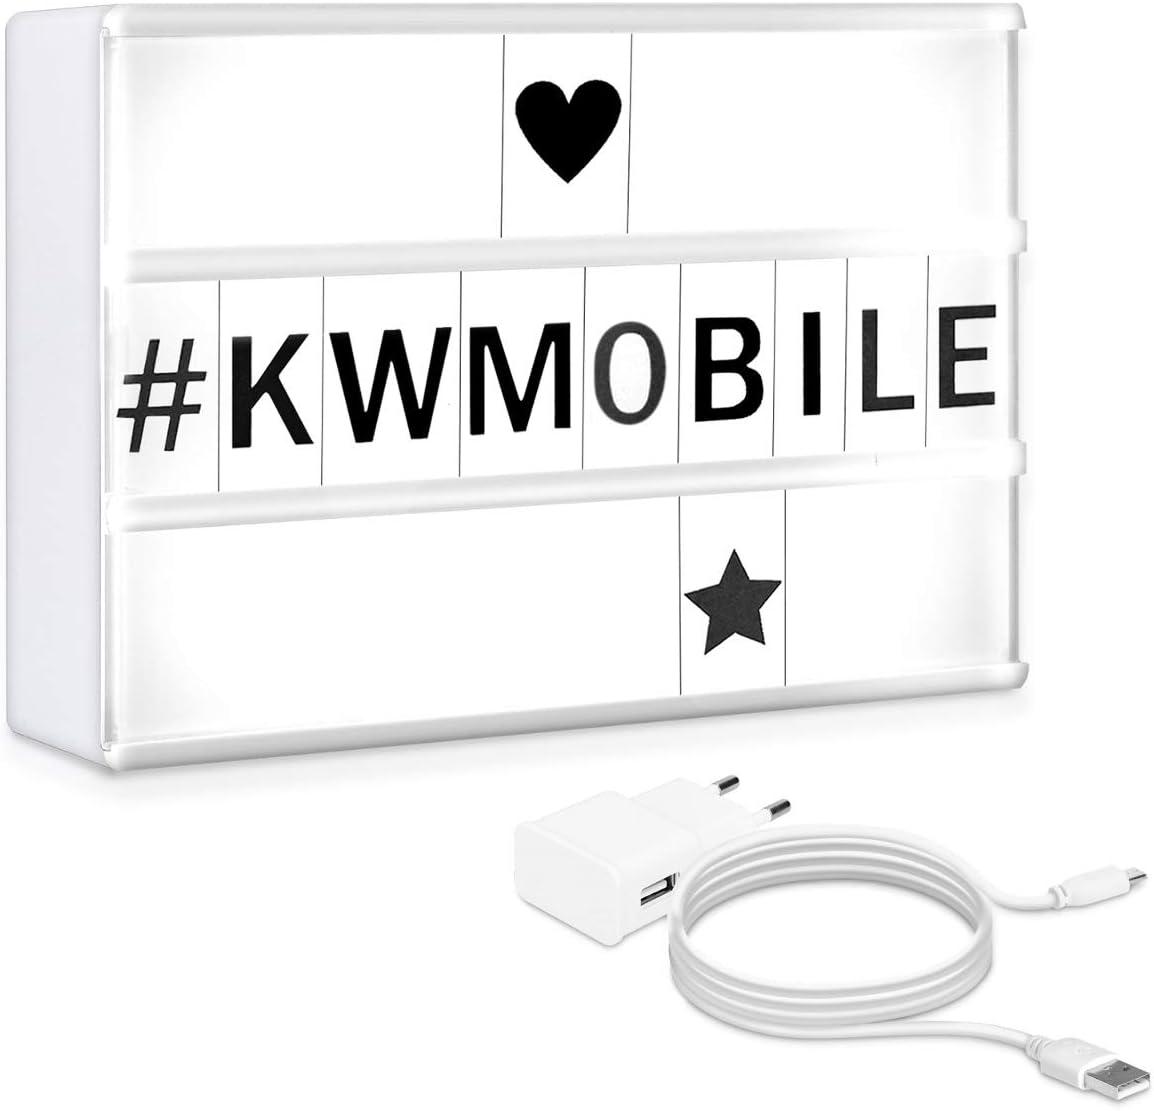 kwmobile Caja de luz cinematográfica LED A5 - Panel de luz con 126 letras símbolos números negros - Lámpara estilo cinema lightbox con enchufe: Amazon.es: Iluminación